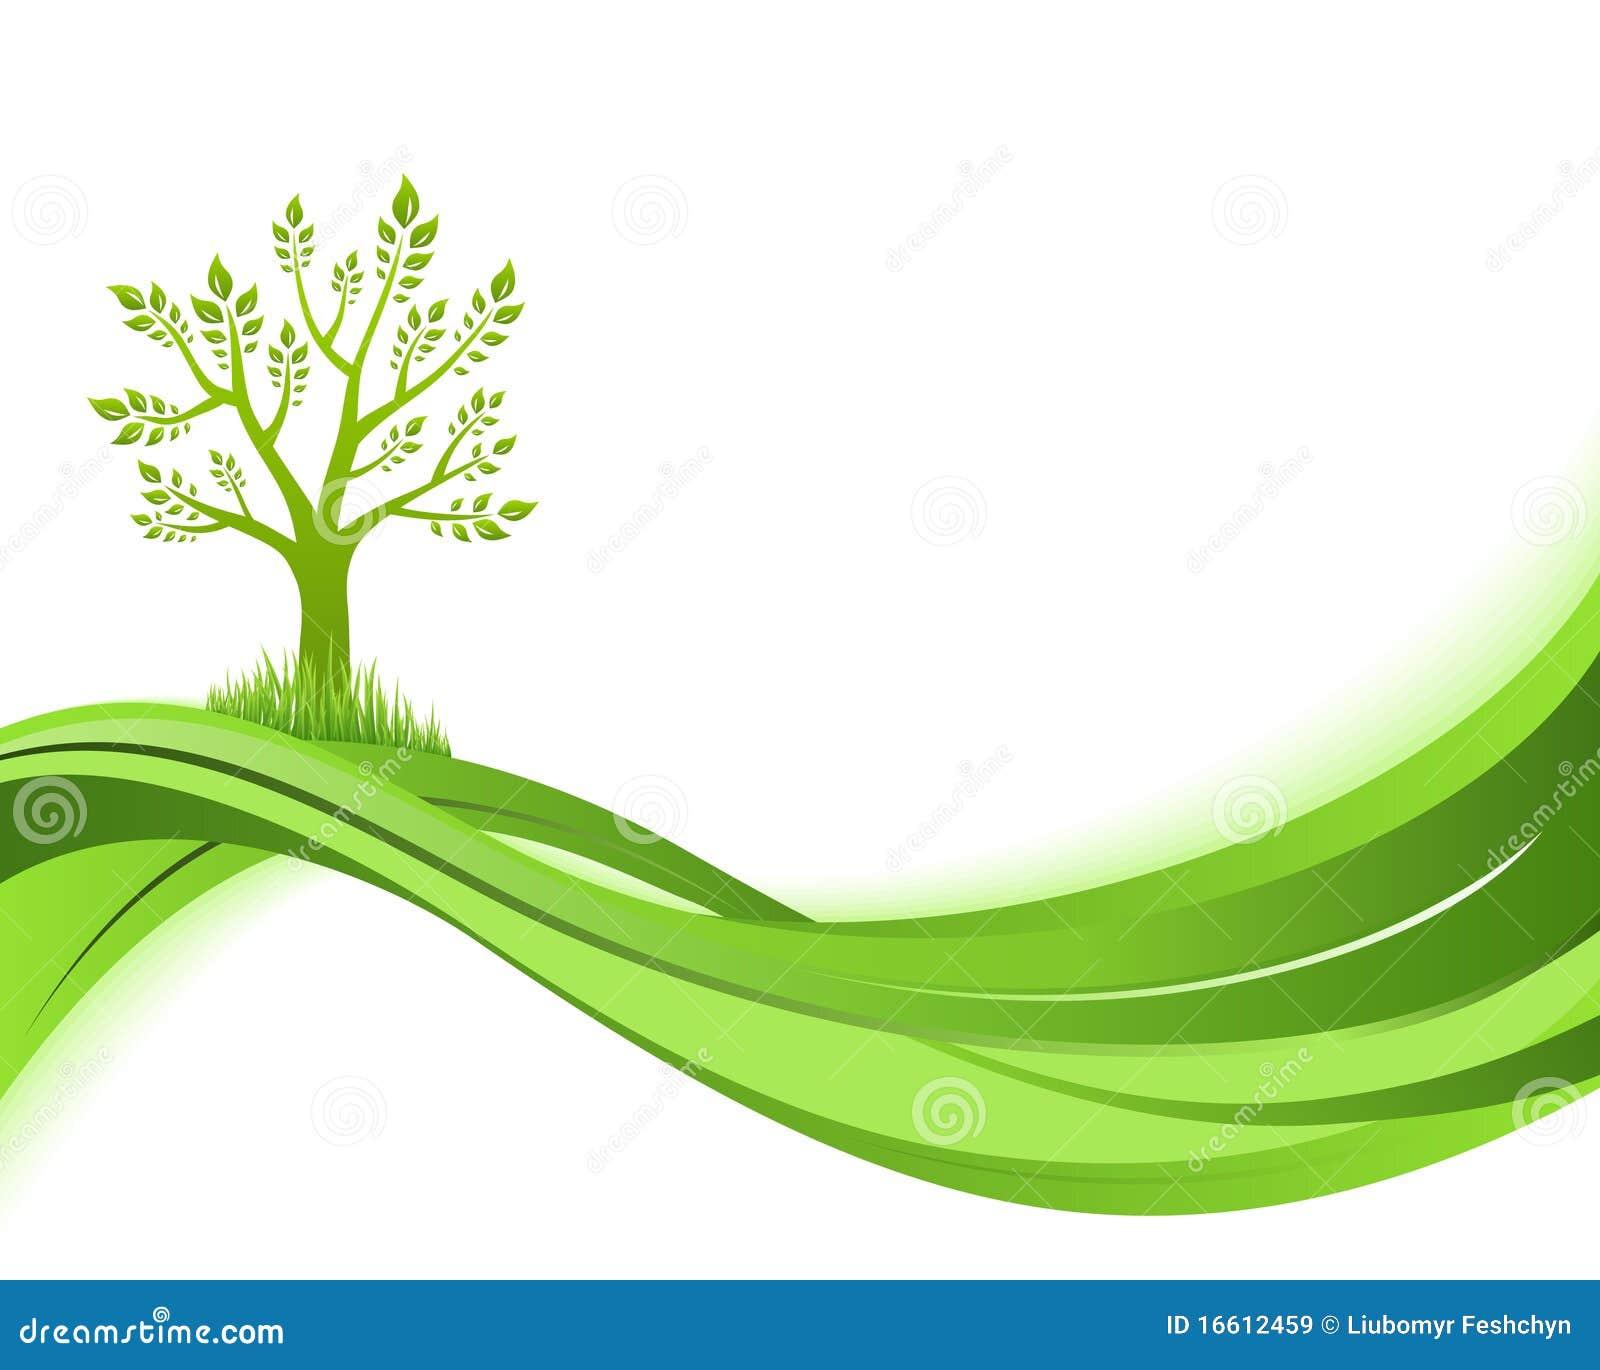 green nature background eco concept illustration stock vector illustration of greenhouse. Black Bedroom Furniture Sets. Home Design Ideas